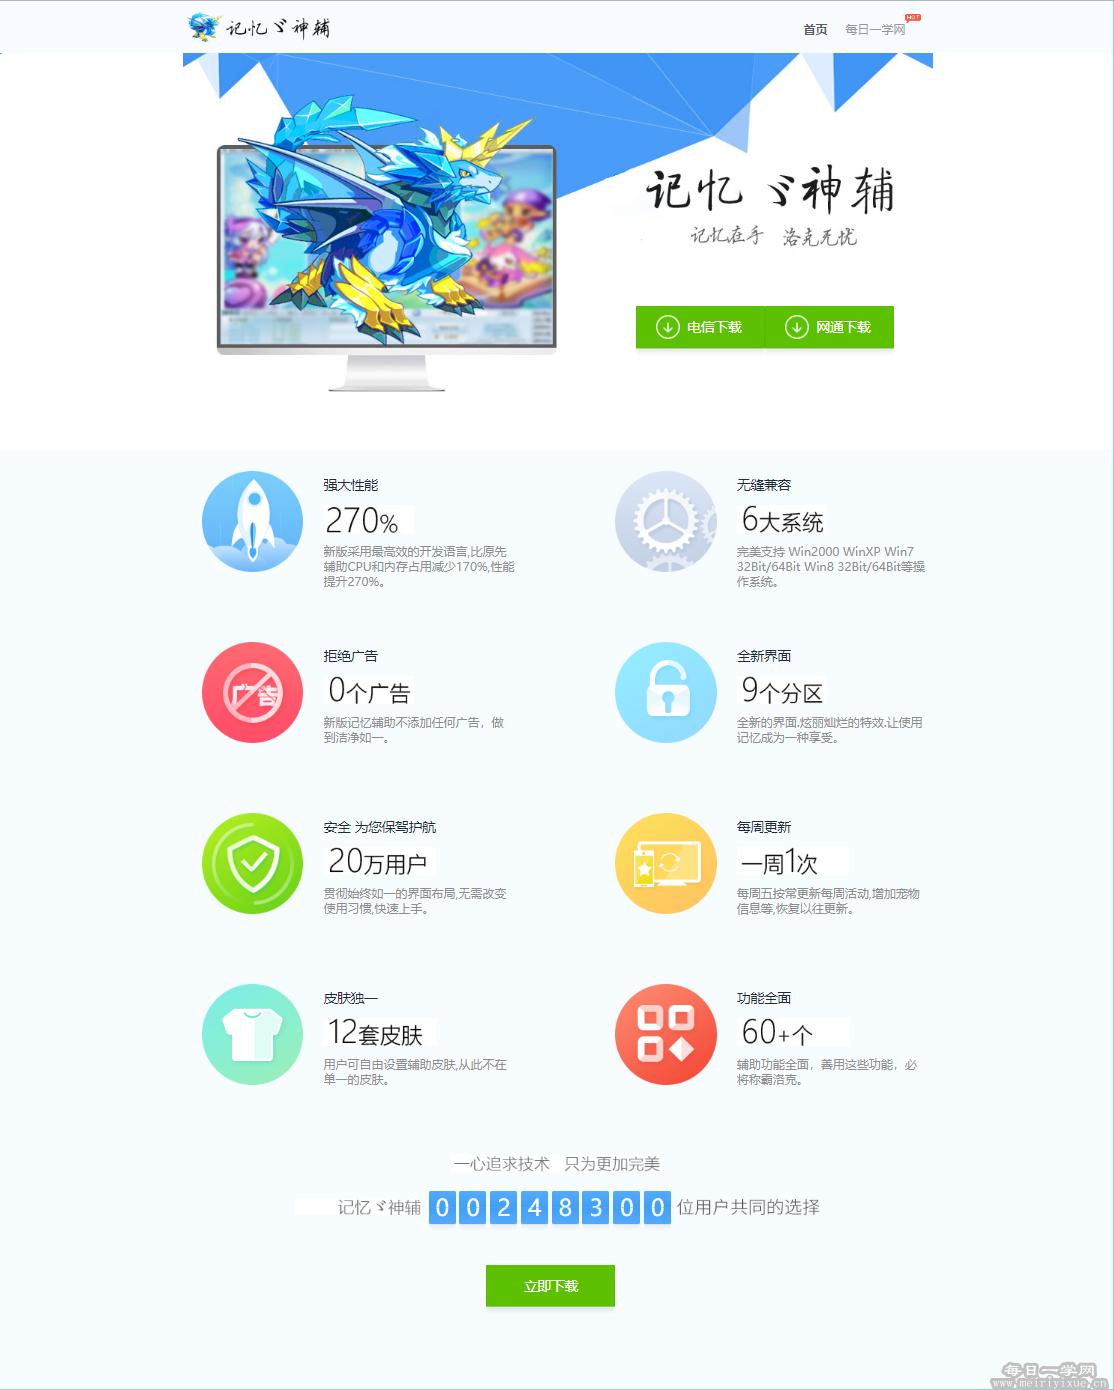 image.png 【源码】好看的app下载页面源码 源码下载